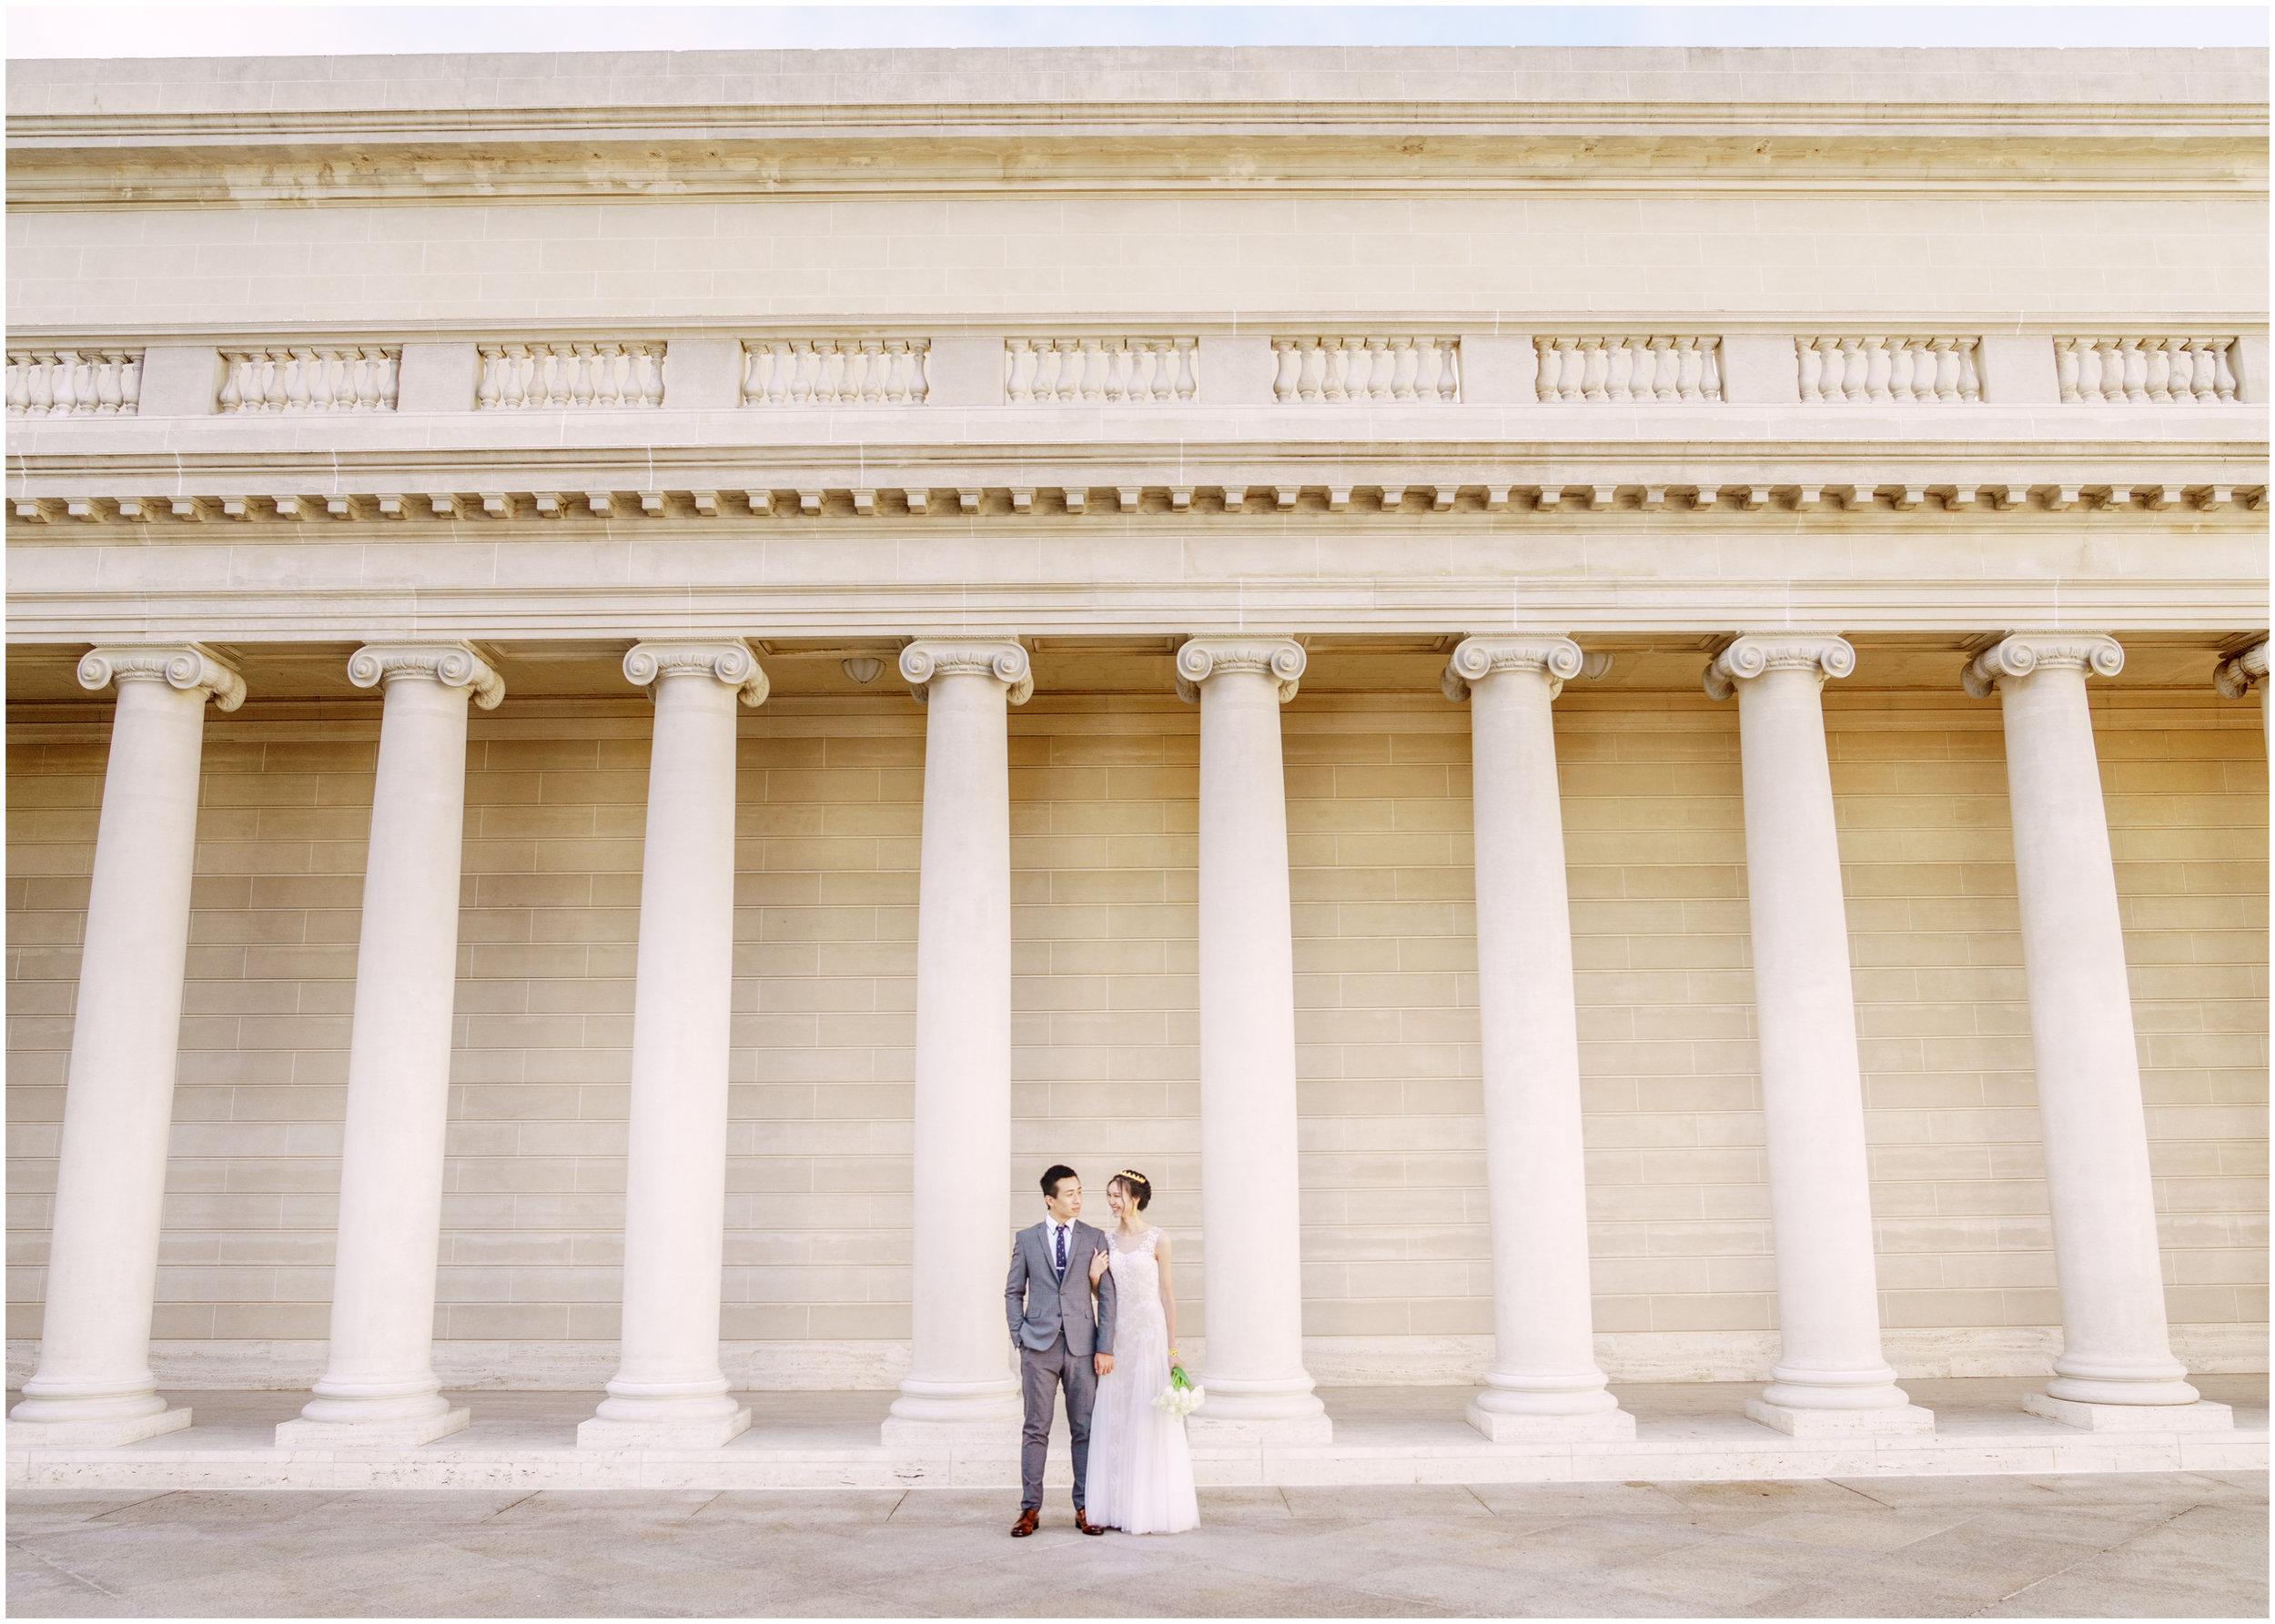 San Francisco Wedding Photographer - Pinnel Photography I&V H-1.jpg